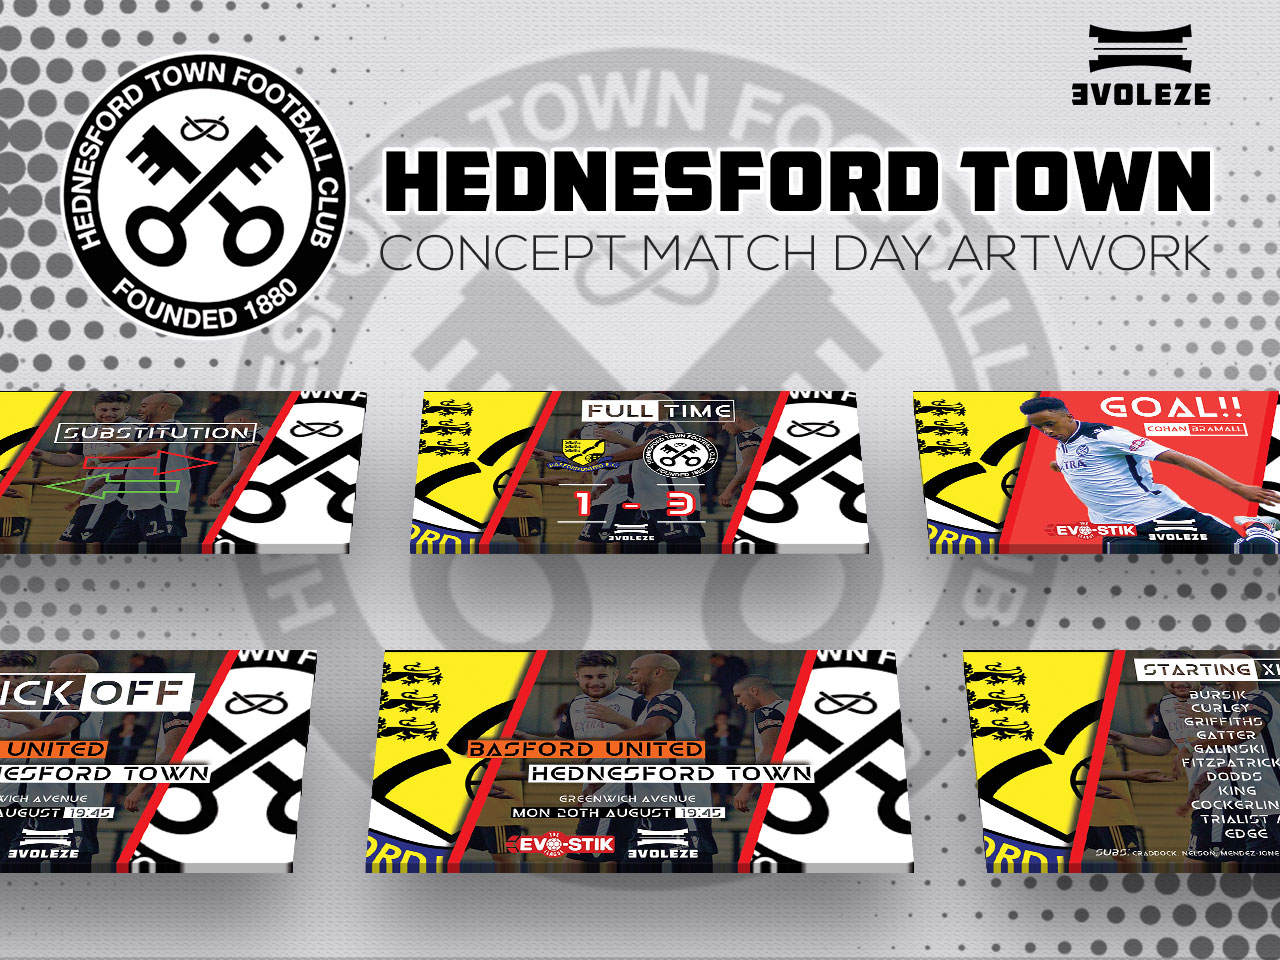 Hednesford Town FC match day artwork set